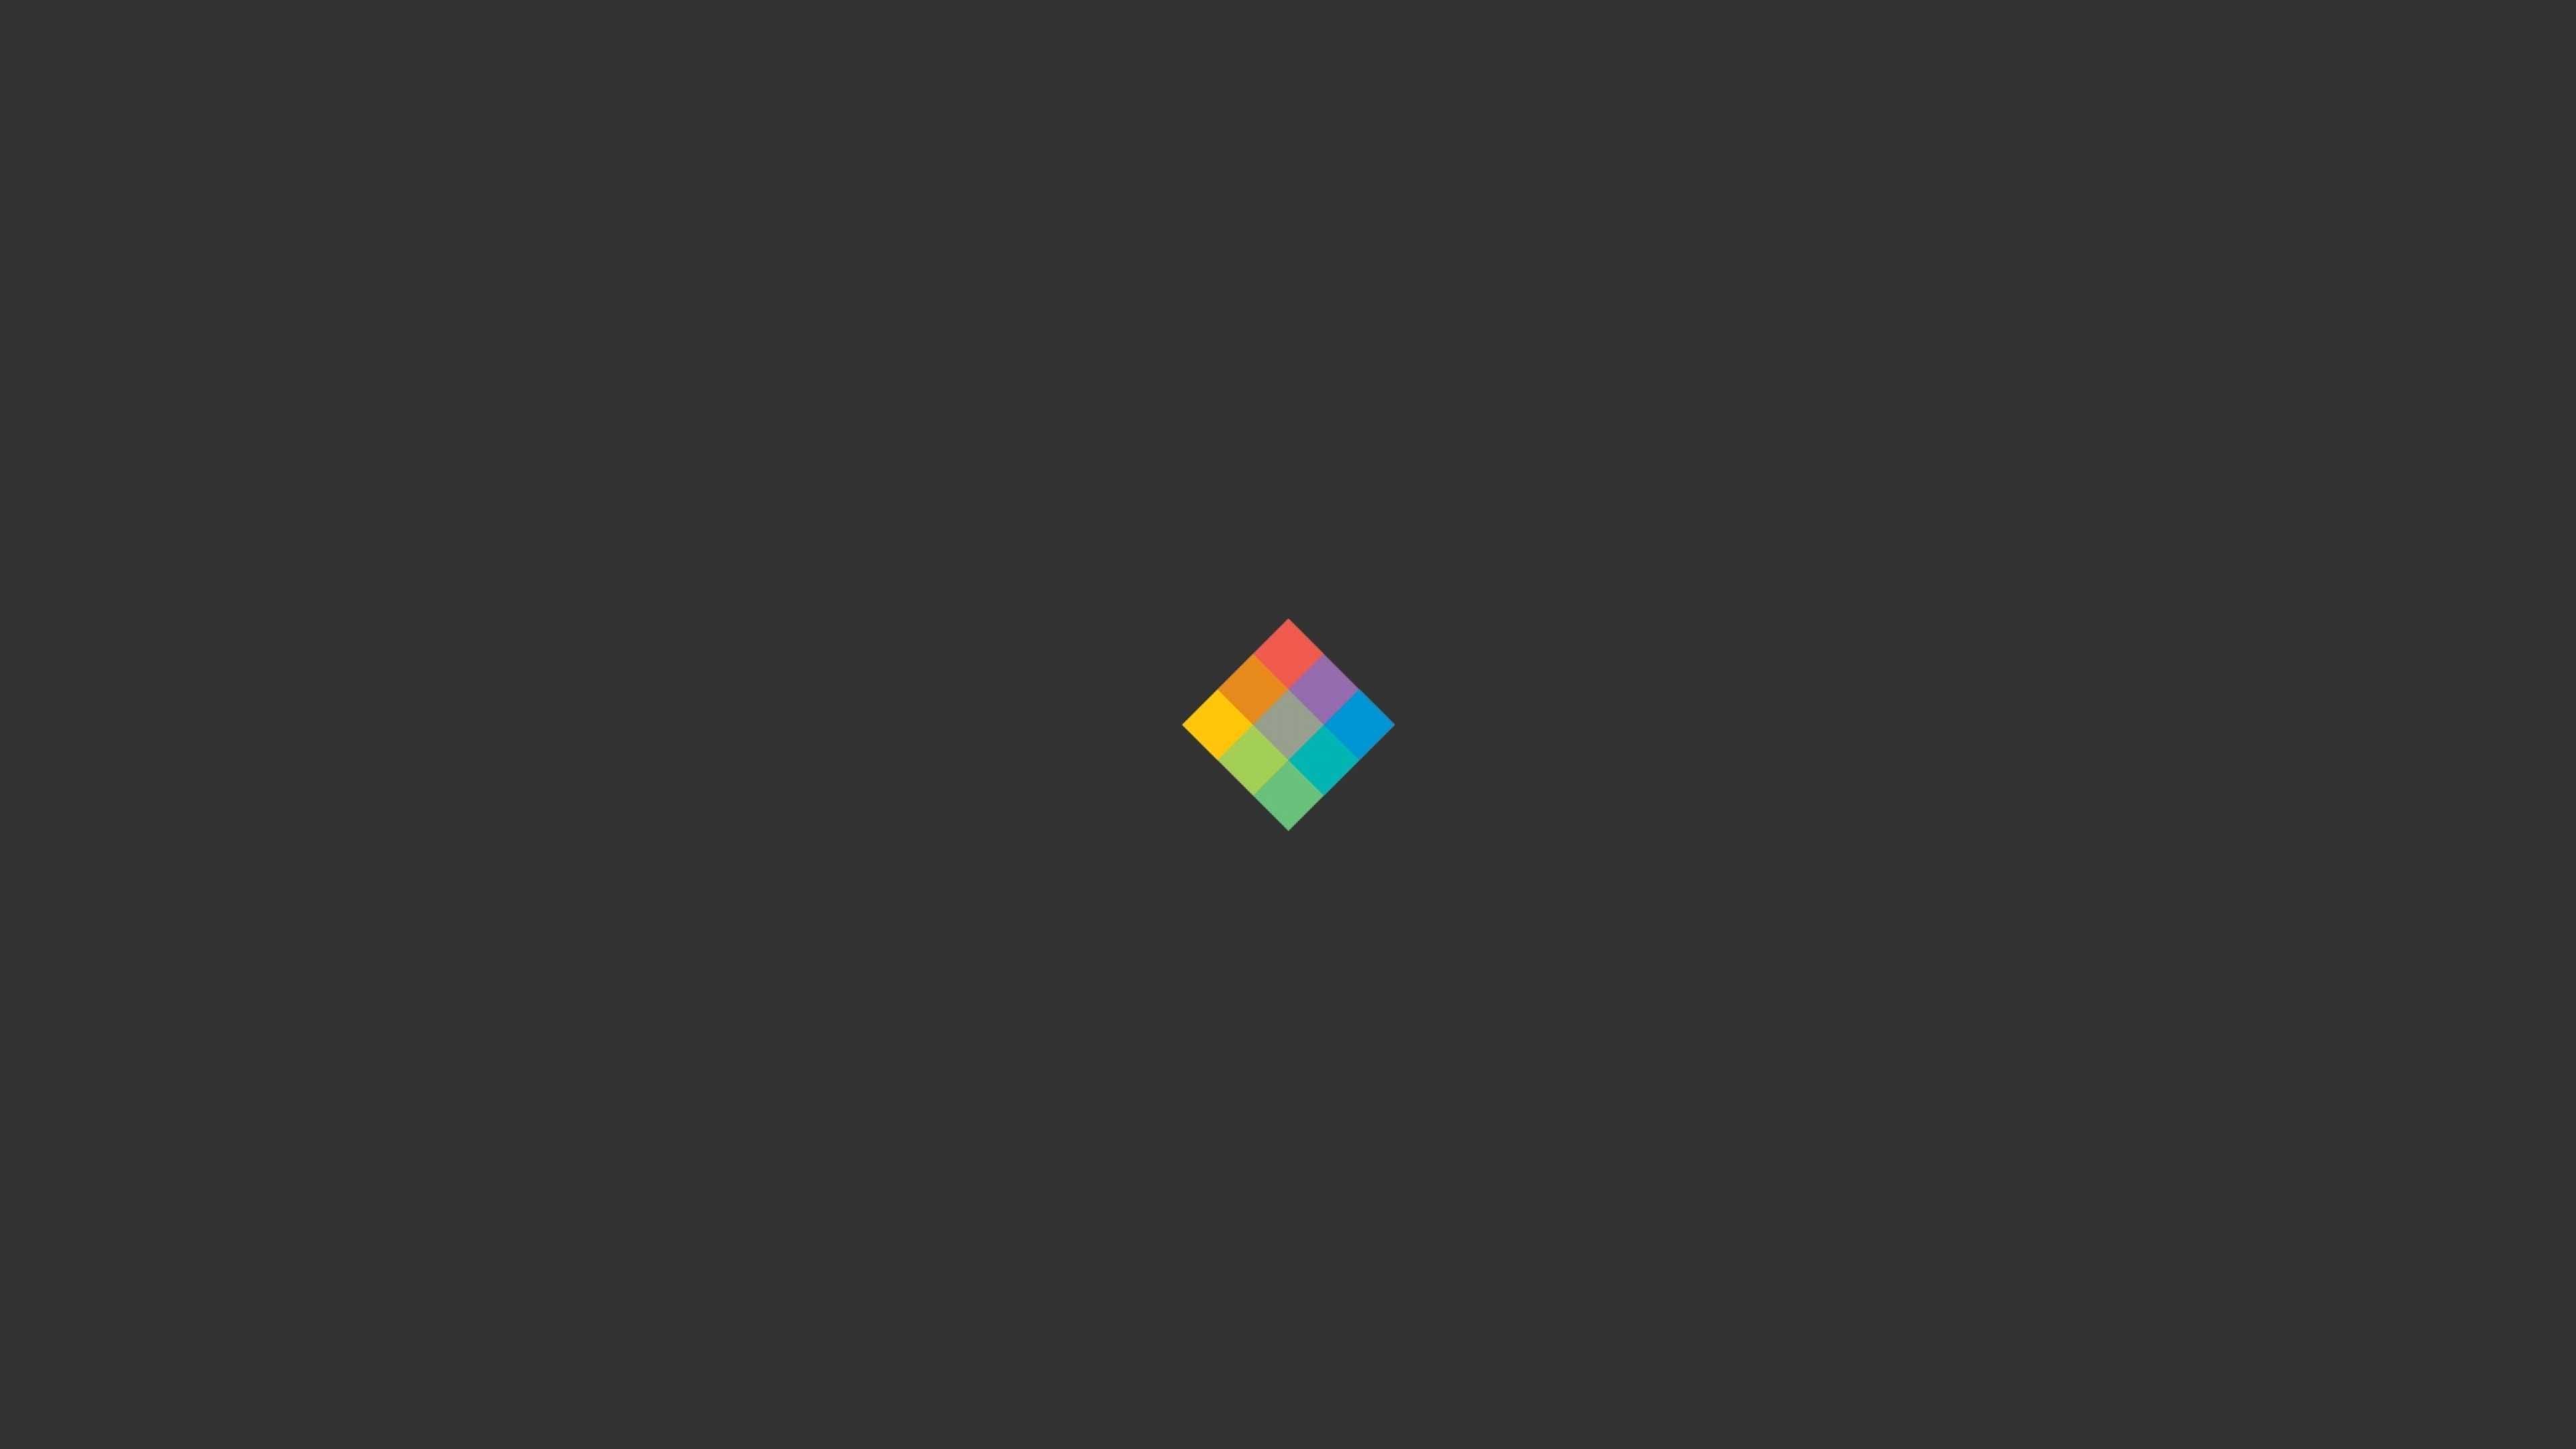 minimalist 4k wallpaper (66+ images)